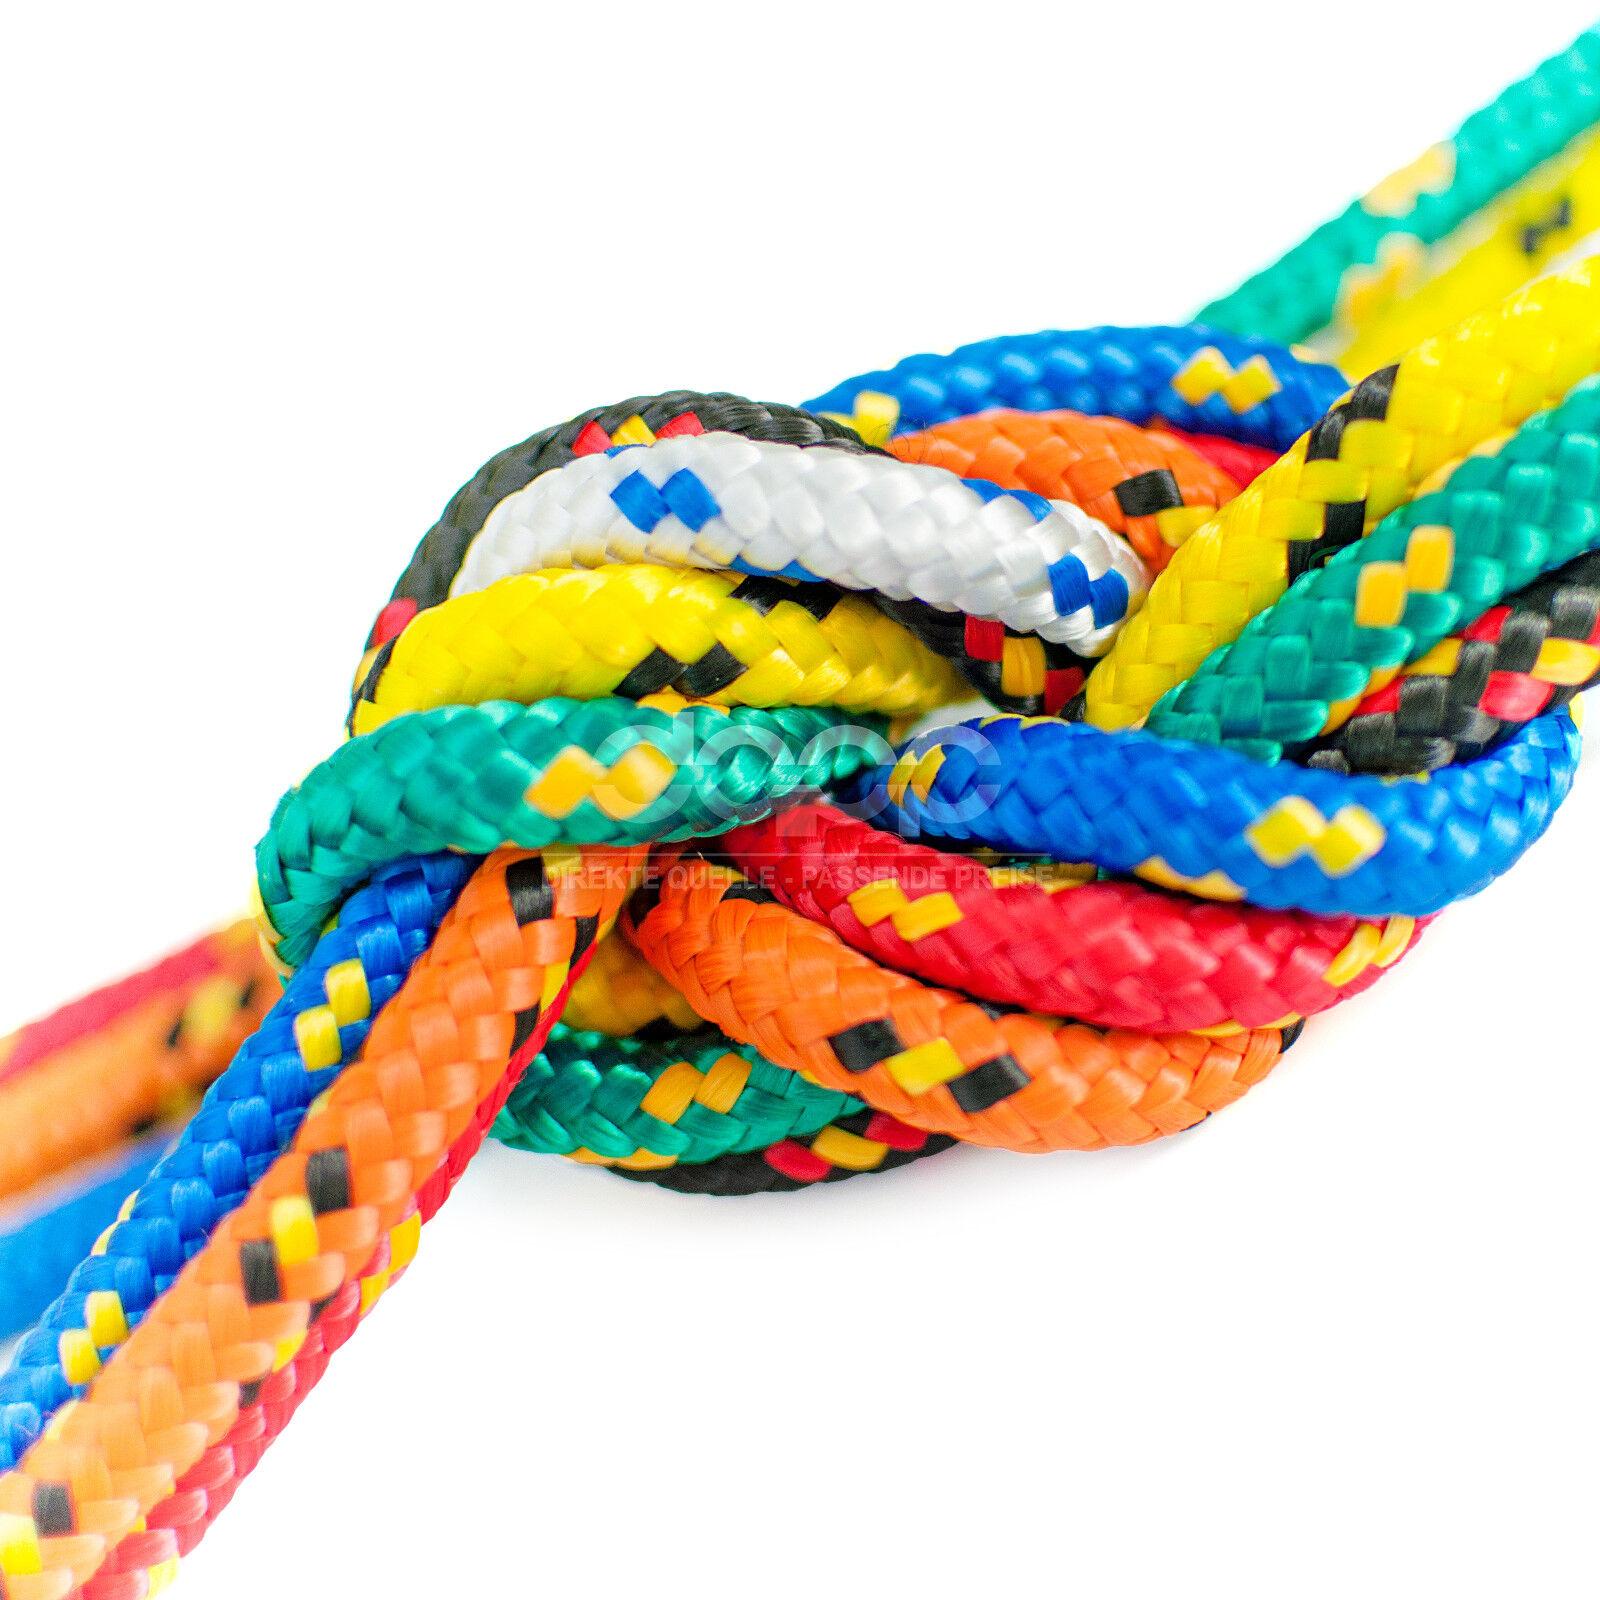 Polypropylen Tauseil geflochten Leine Seile Polypropylenseil Polypropylenseil Seile ab 10 bis 50 Meter 47e9cd